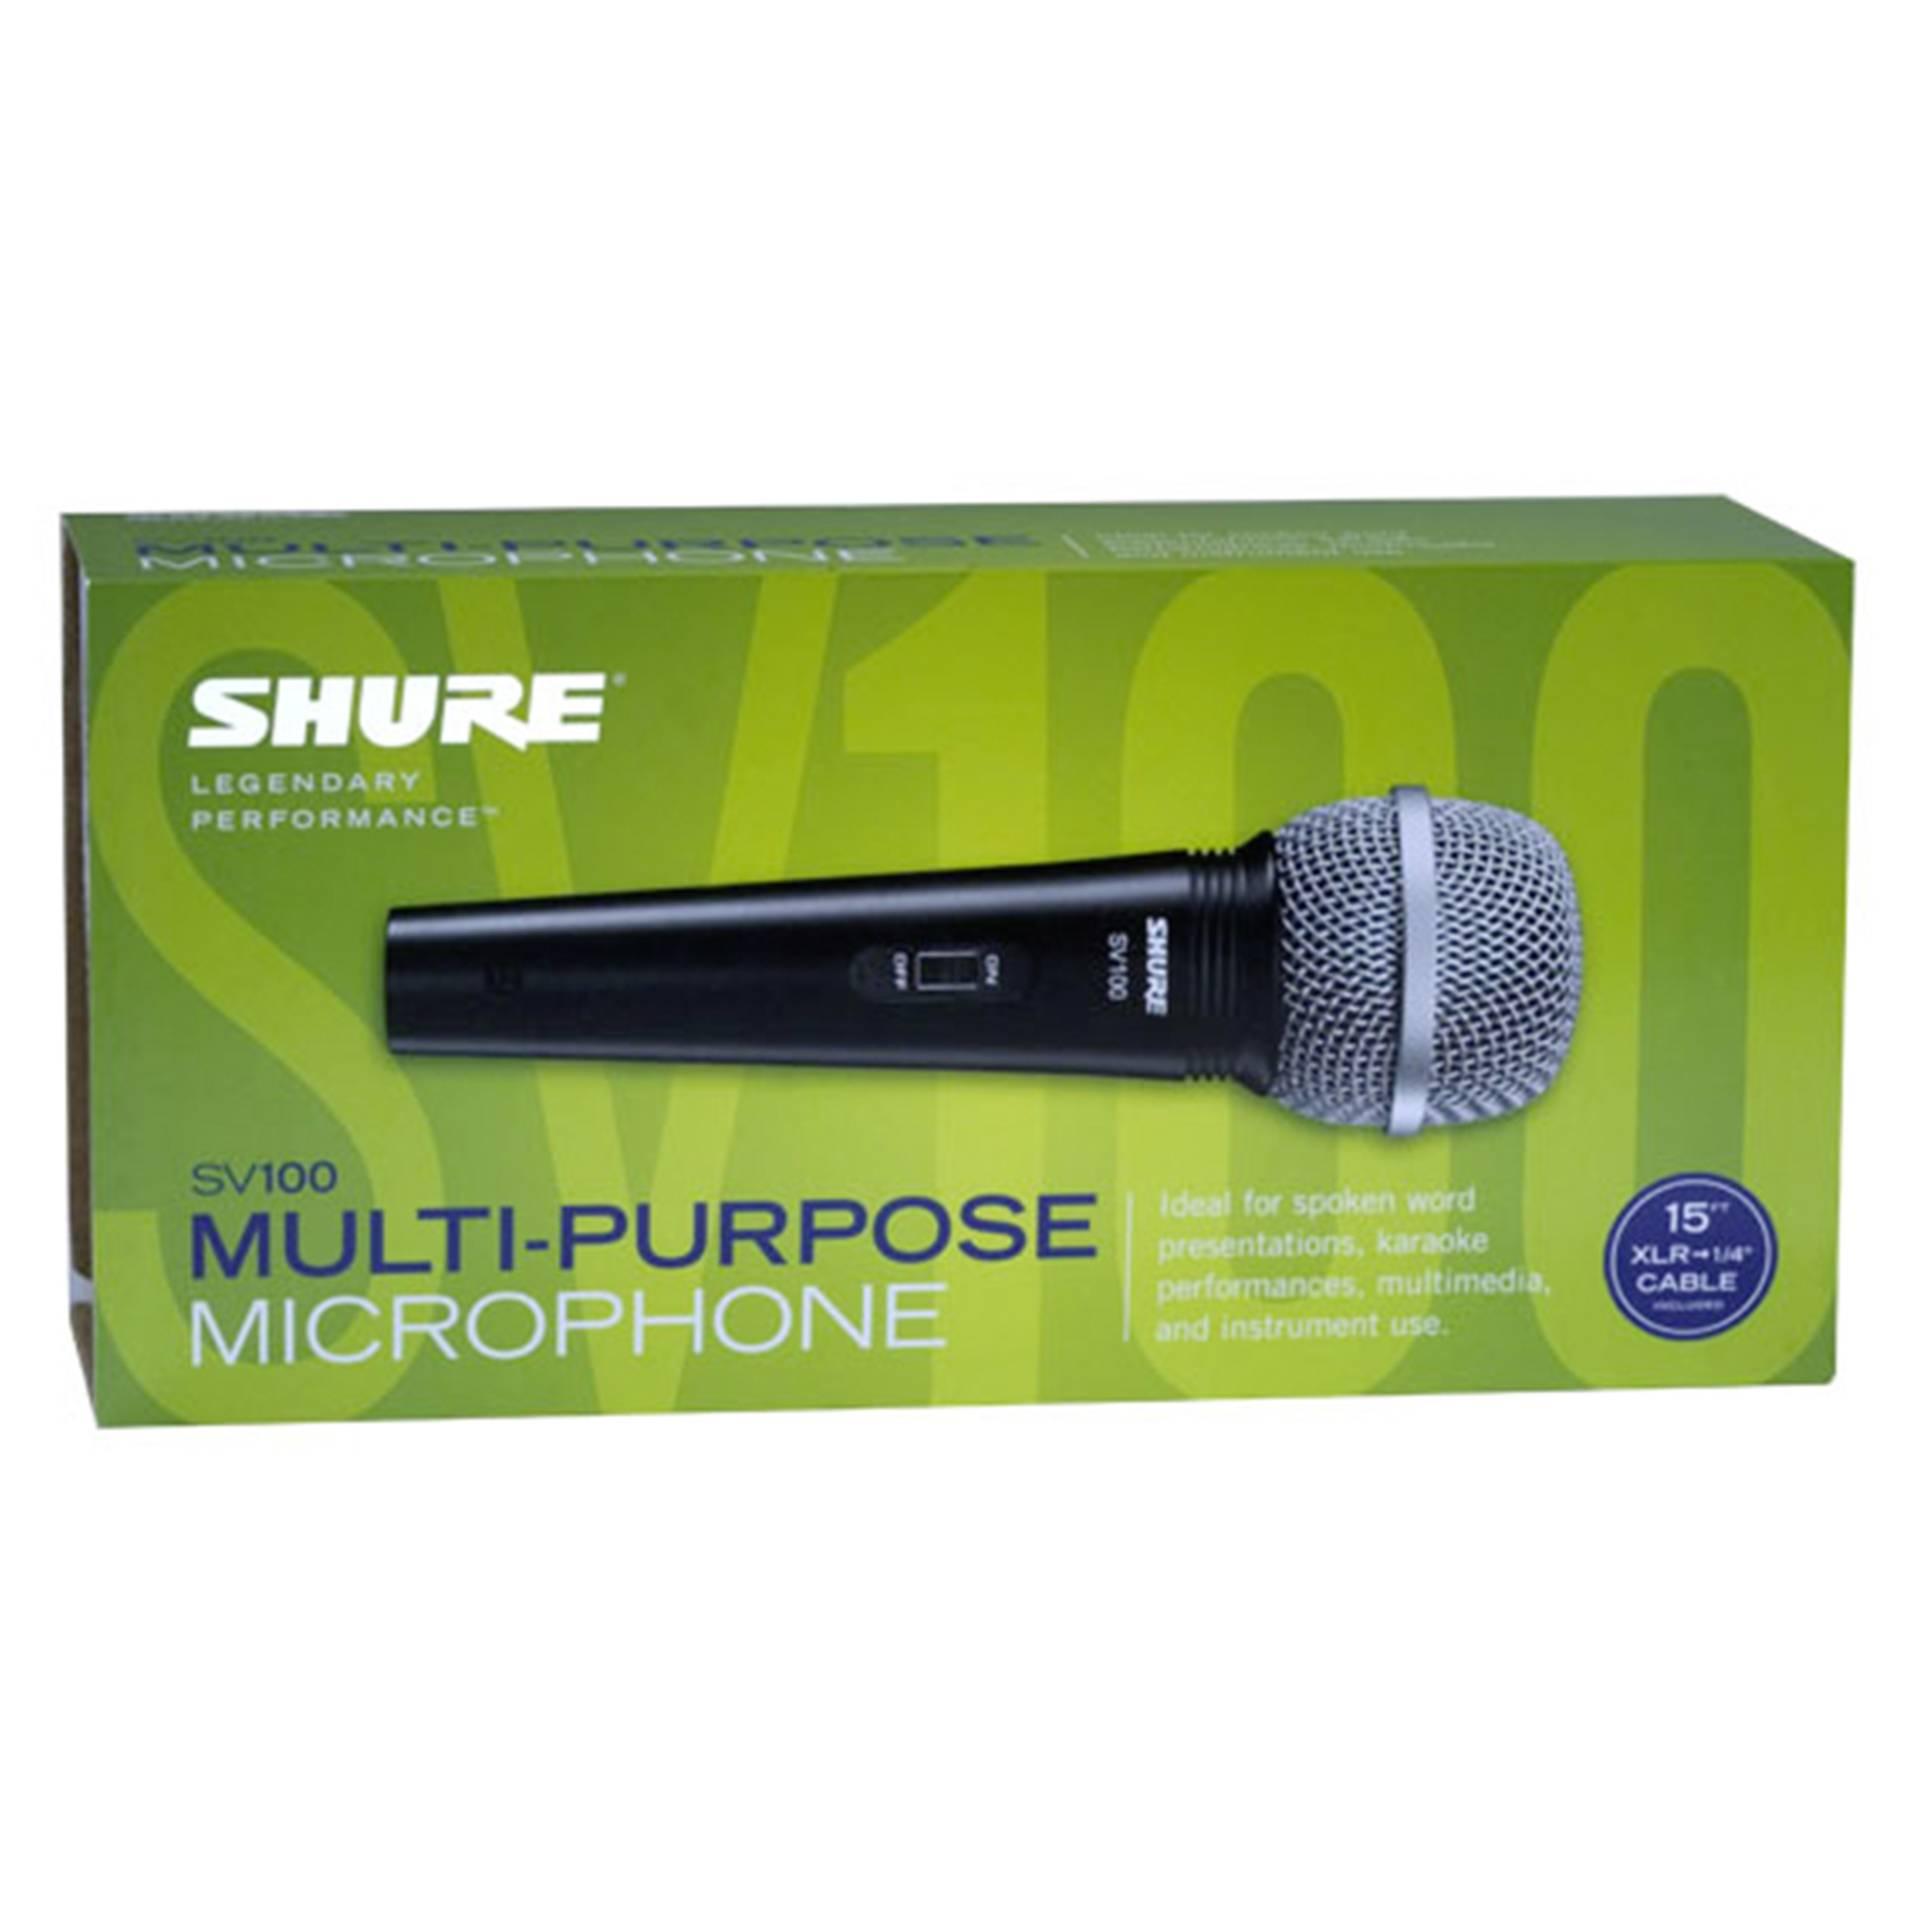 Shure SV100 microphone